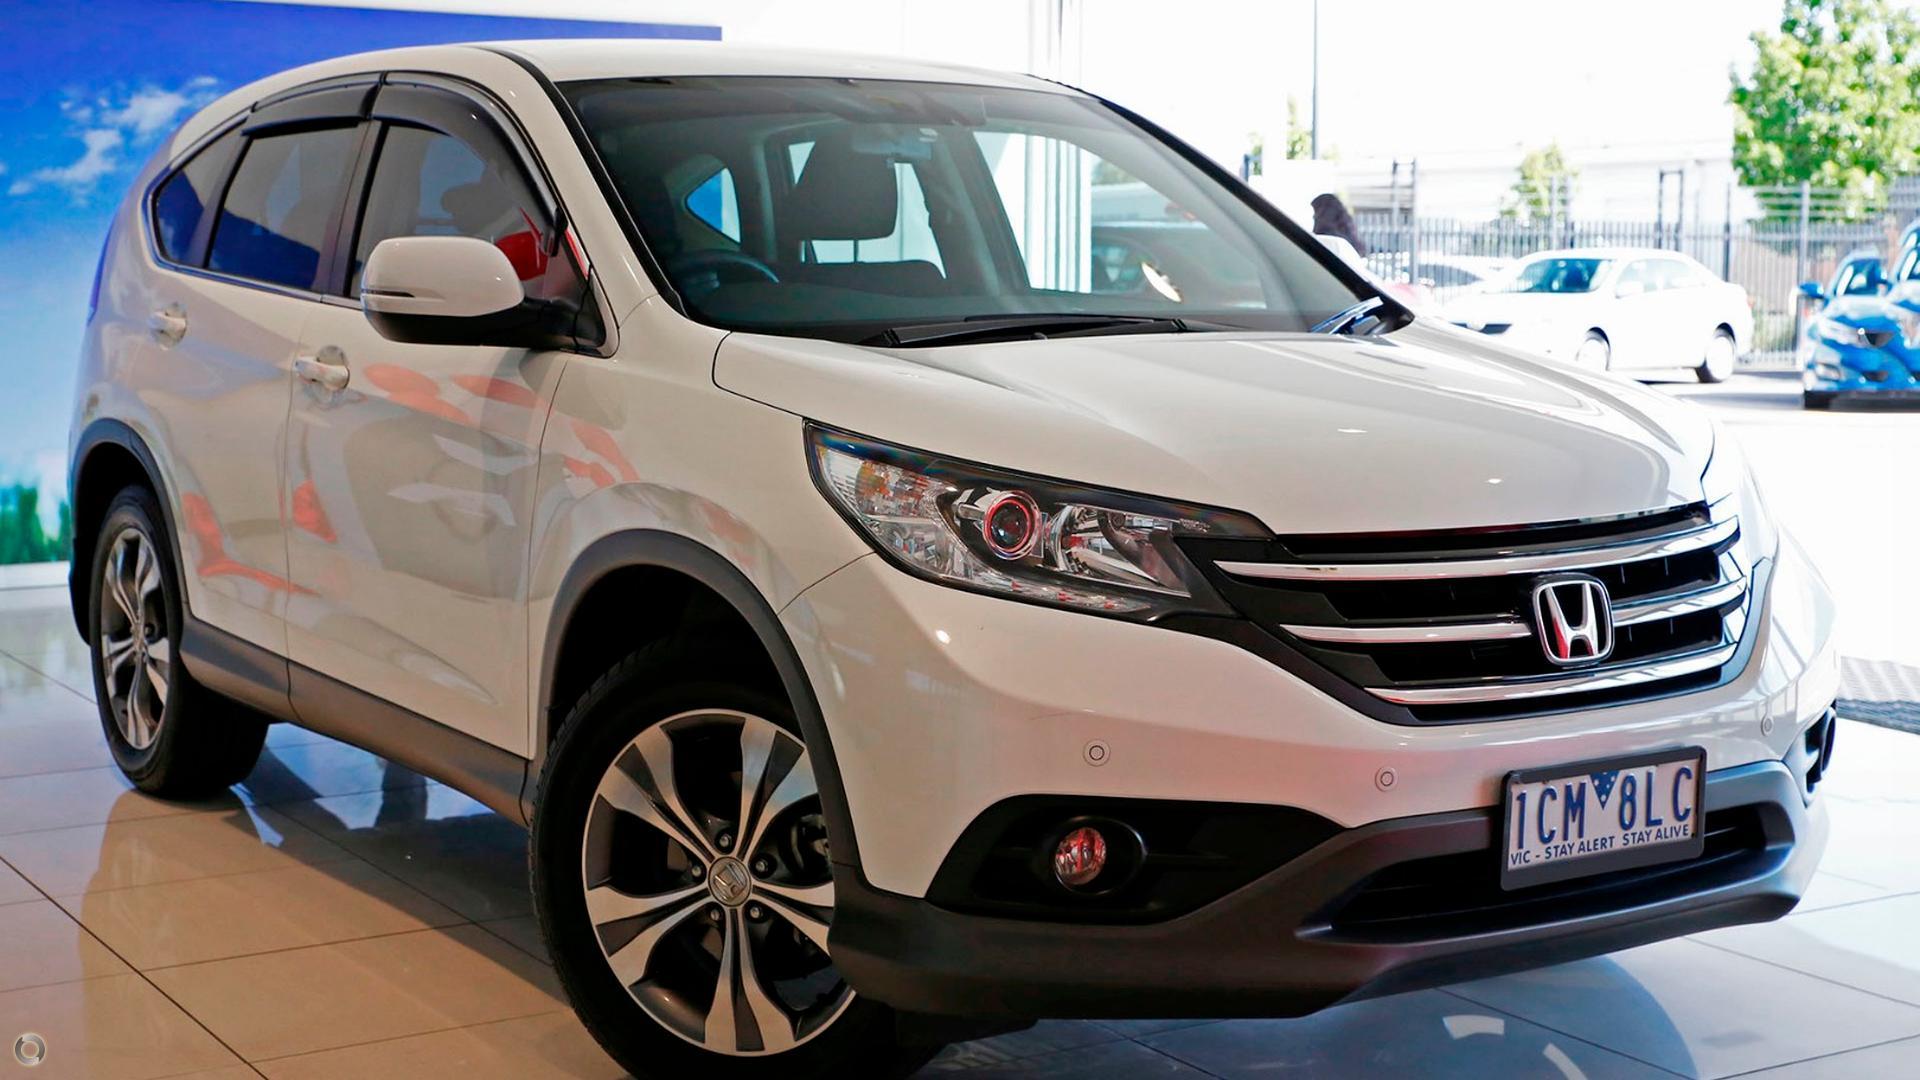 2014 Honda Cr-v VTi Plus RM